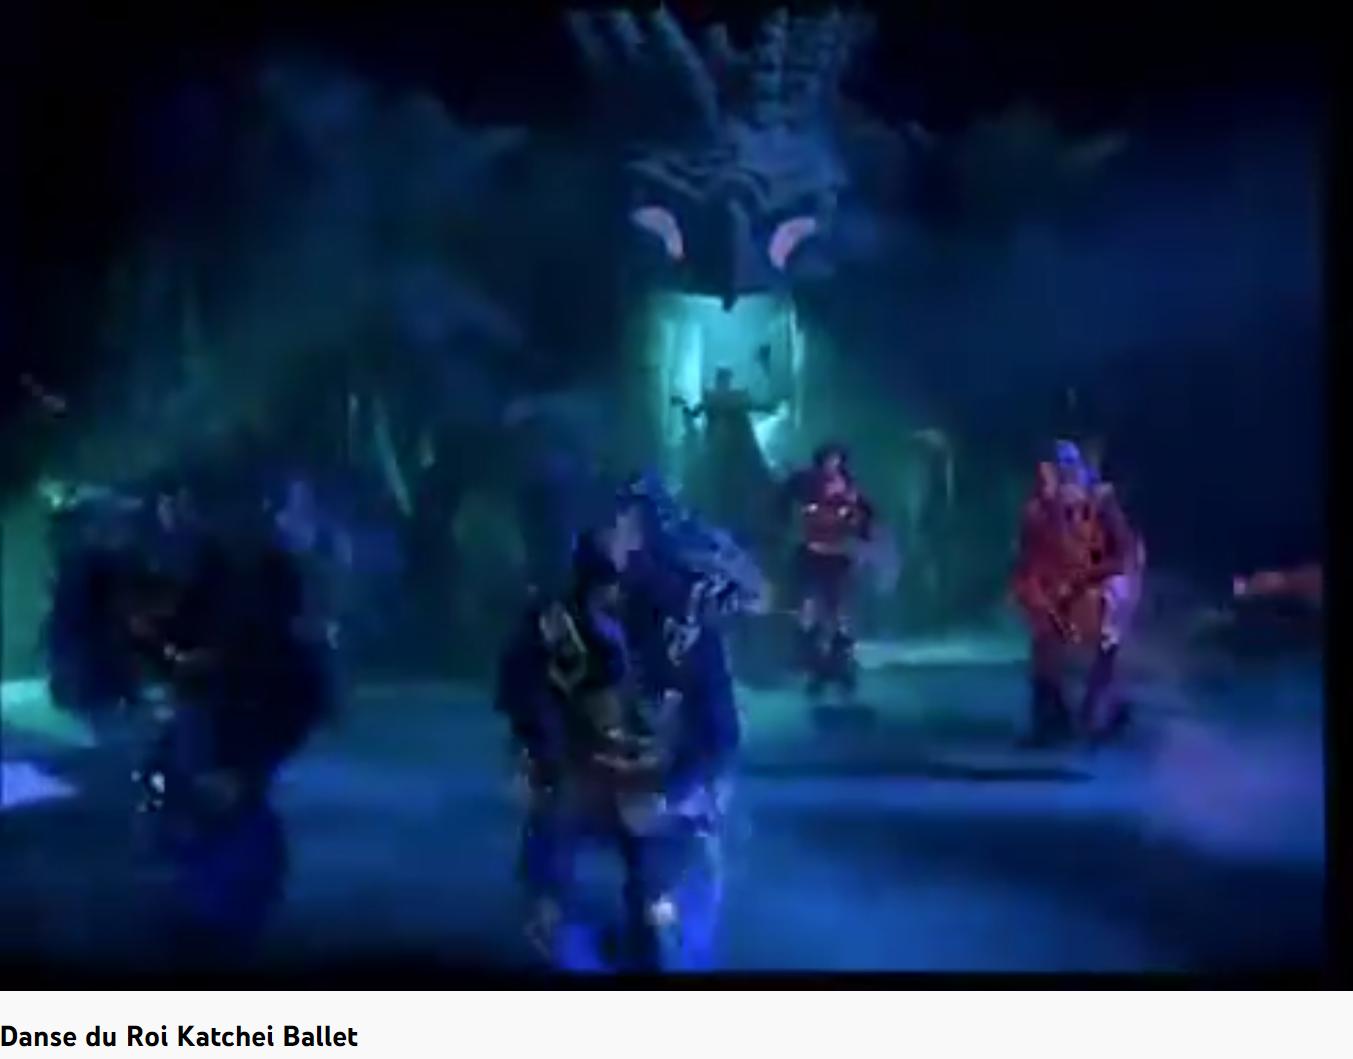 Stravinsky l'Oiseau de feu danse infernale des sujets du roi Katcheï